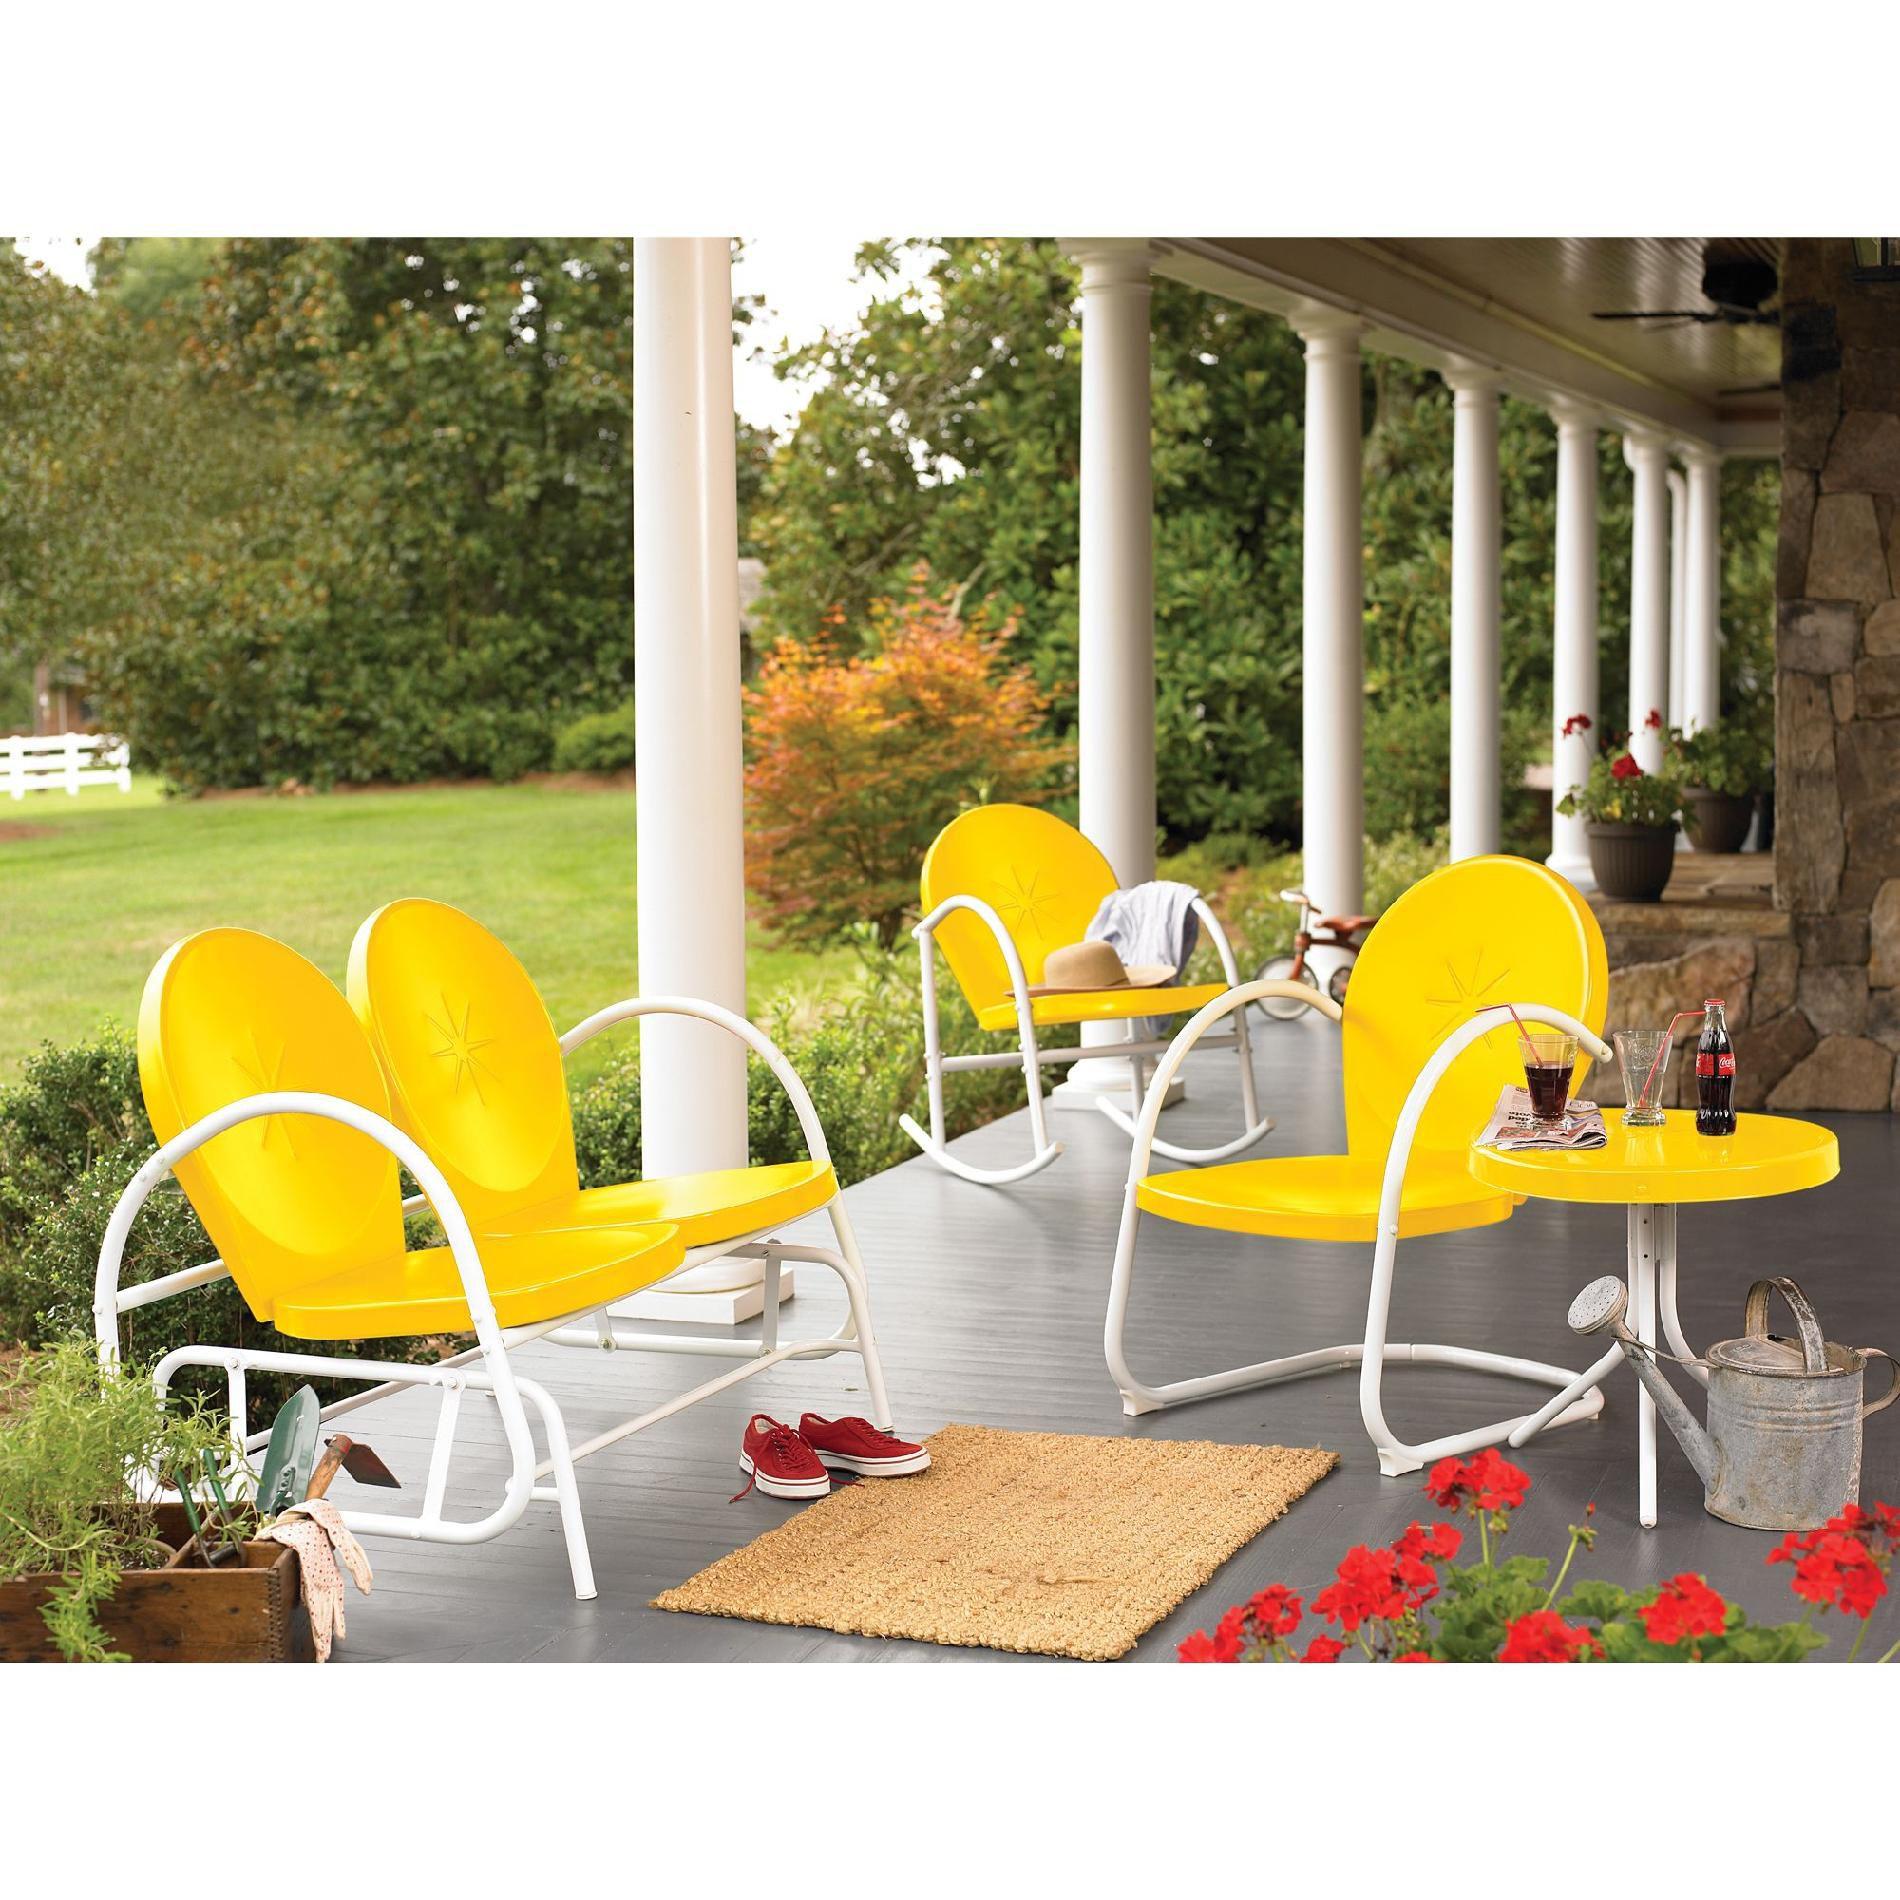 Garden Oasis Retro Steel Clam Chair - Yellow